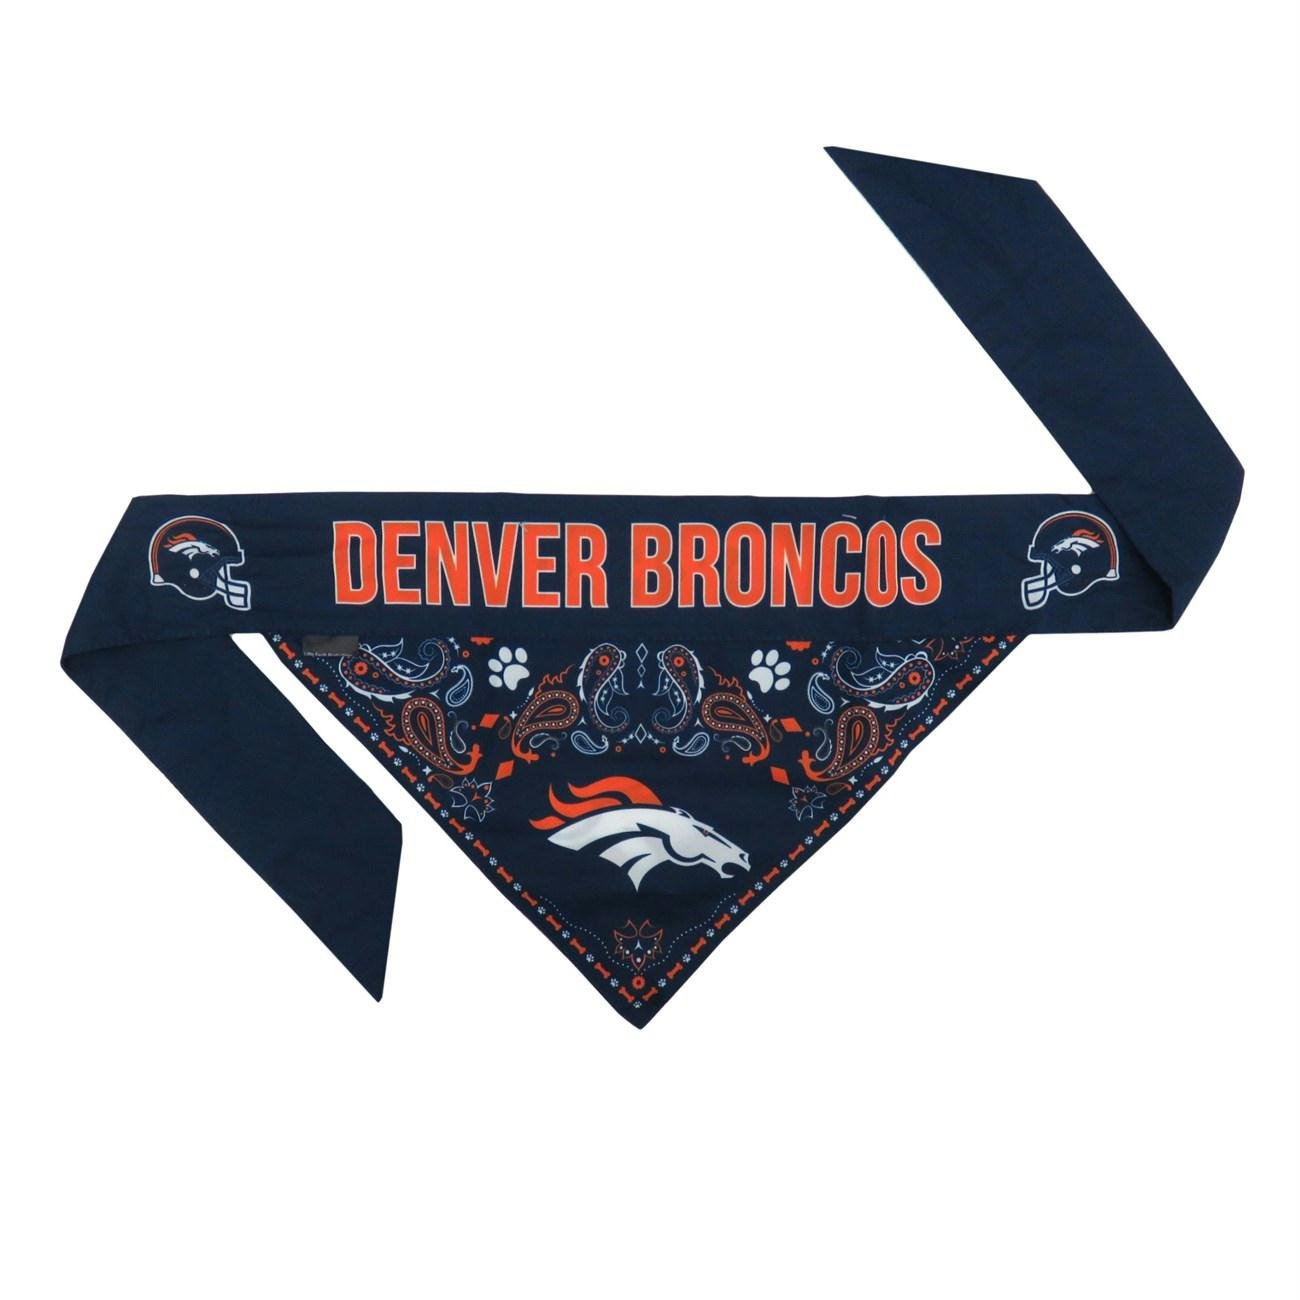 Denver Broncos Pet Reversible Paisley Bandana - Medium